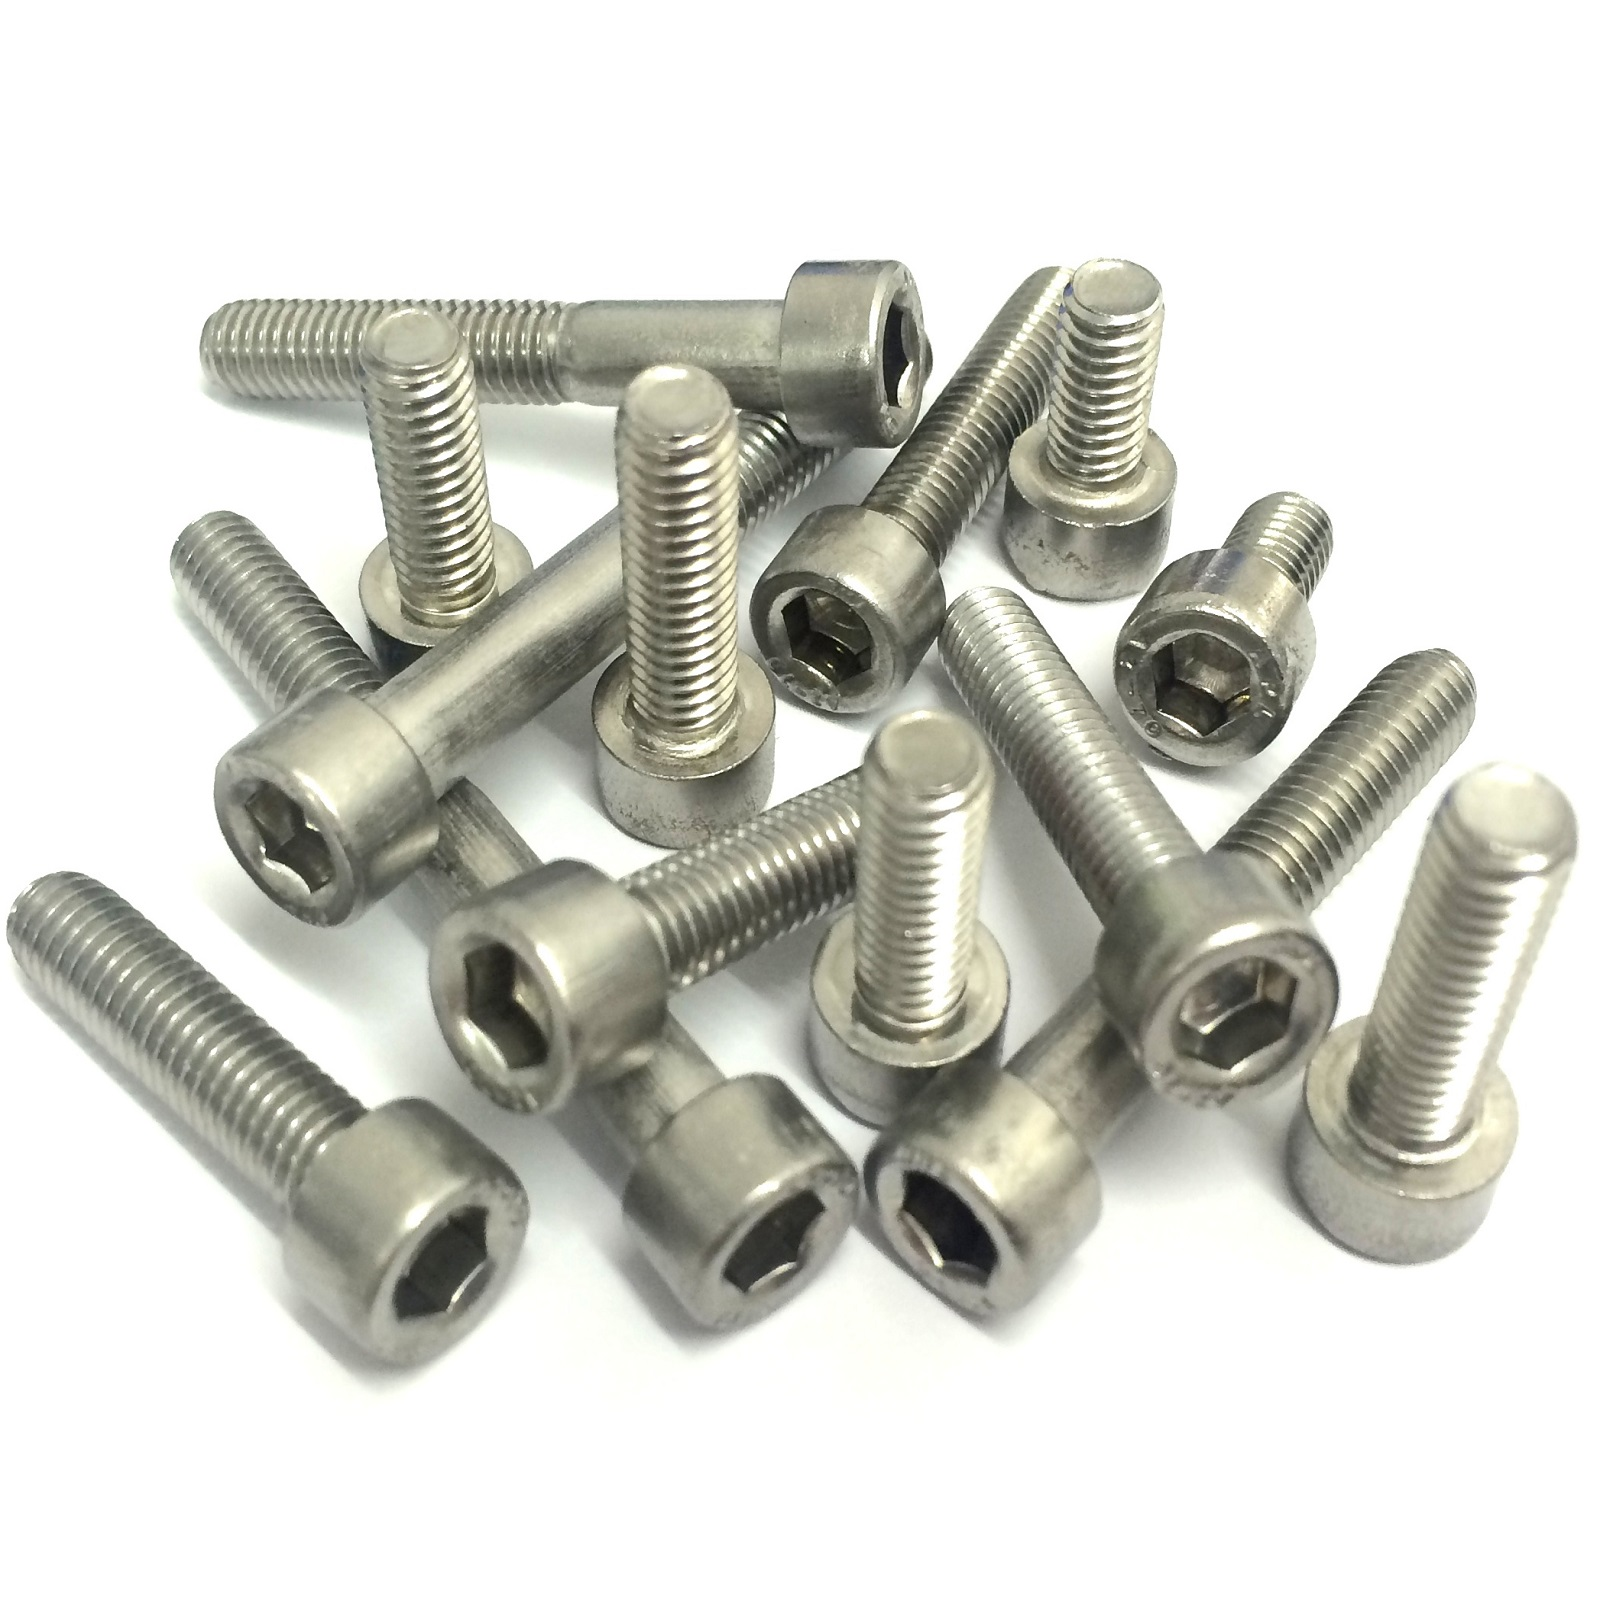 Stainless Steel Allen Hex Socket Cap Head Screws Bolts M3 M4 M5 M6 M8 M10 DIN912